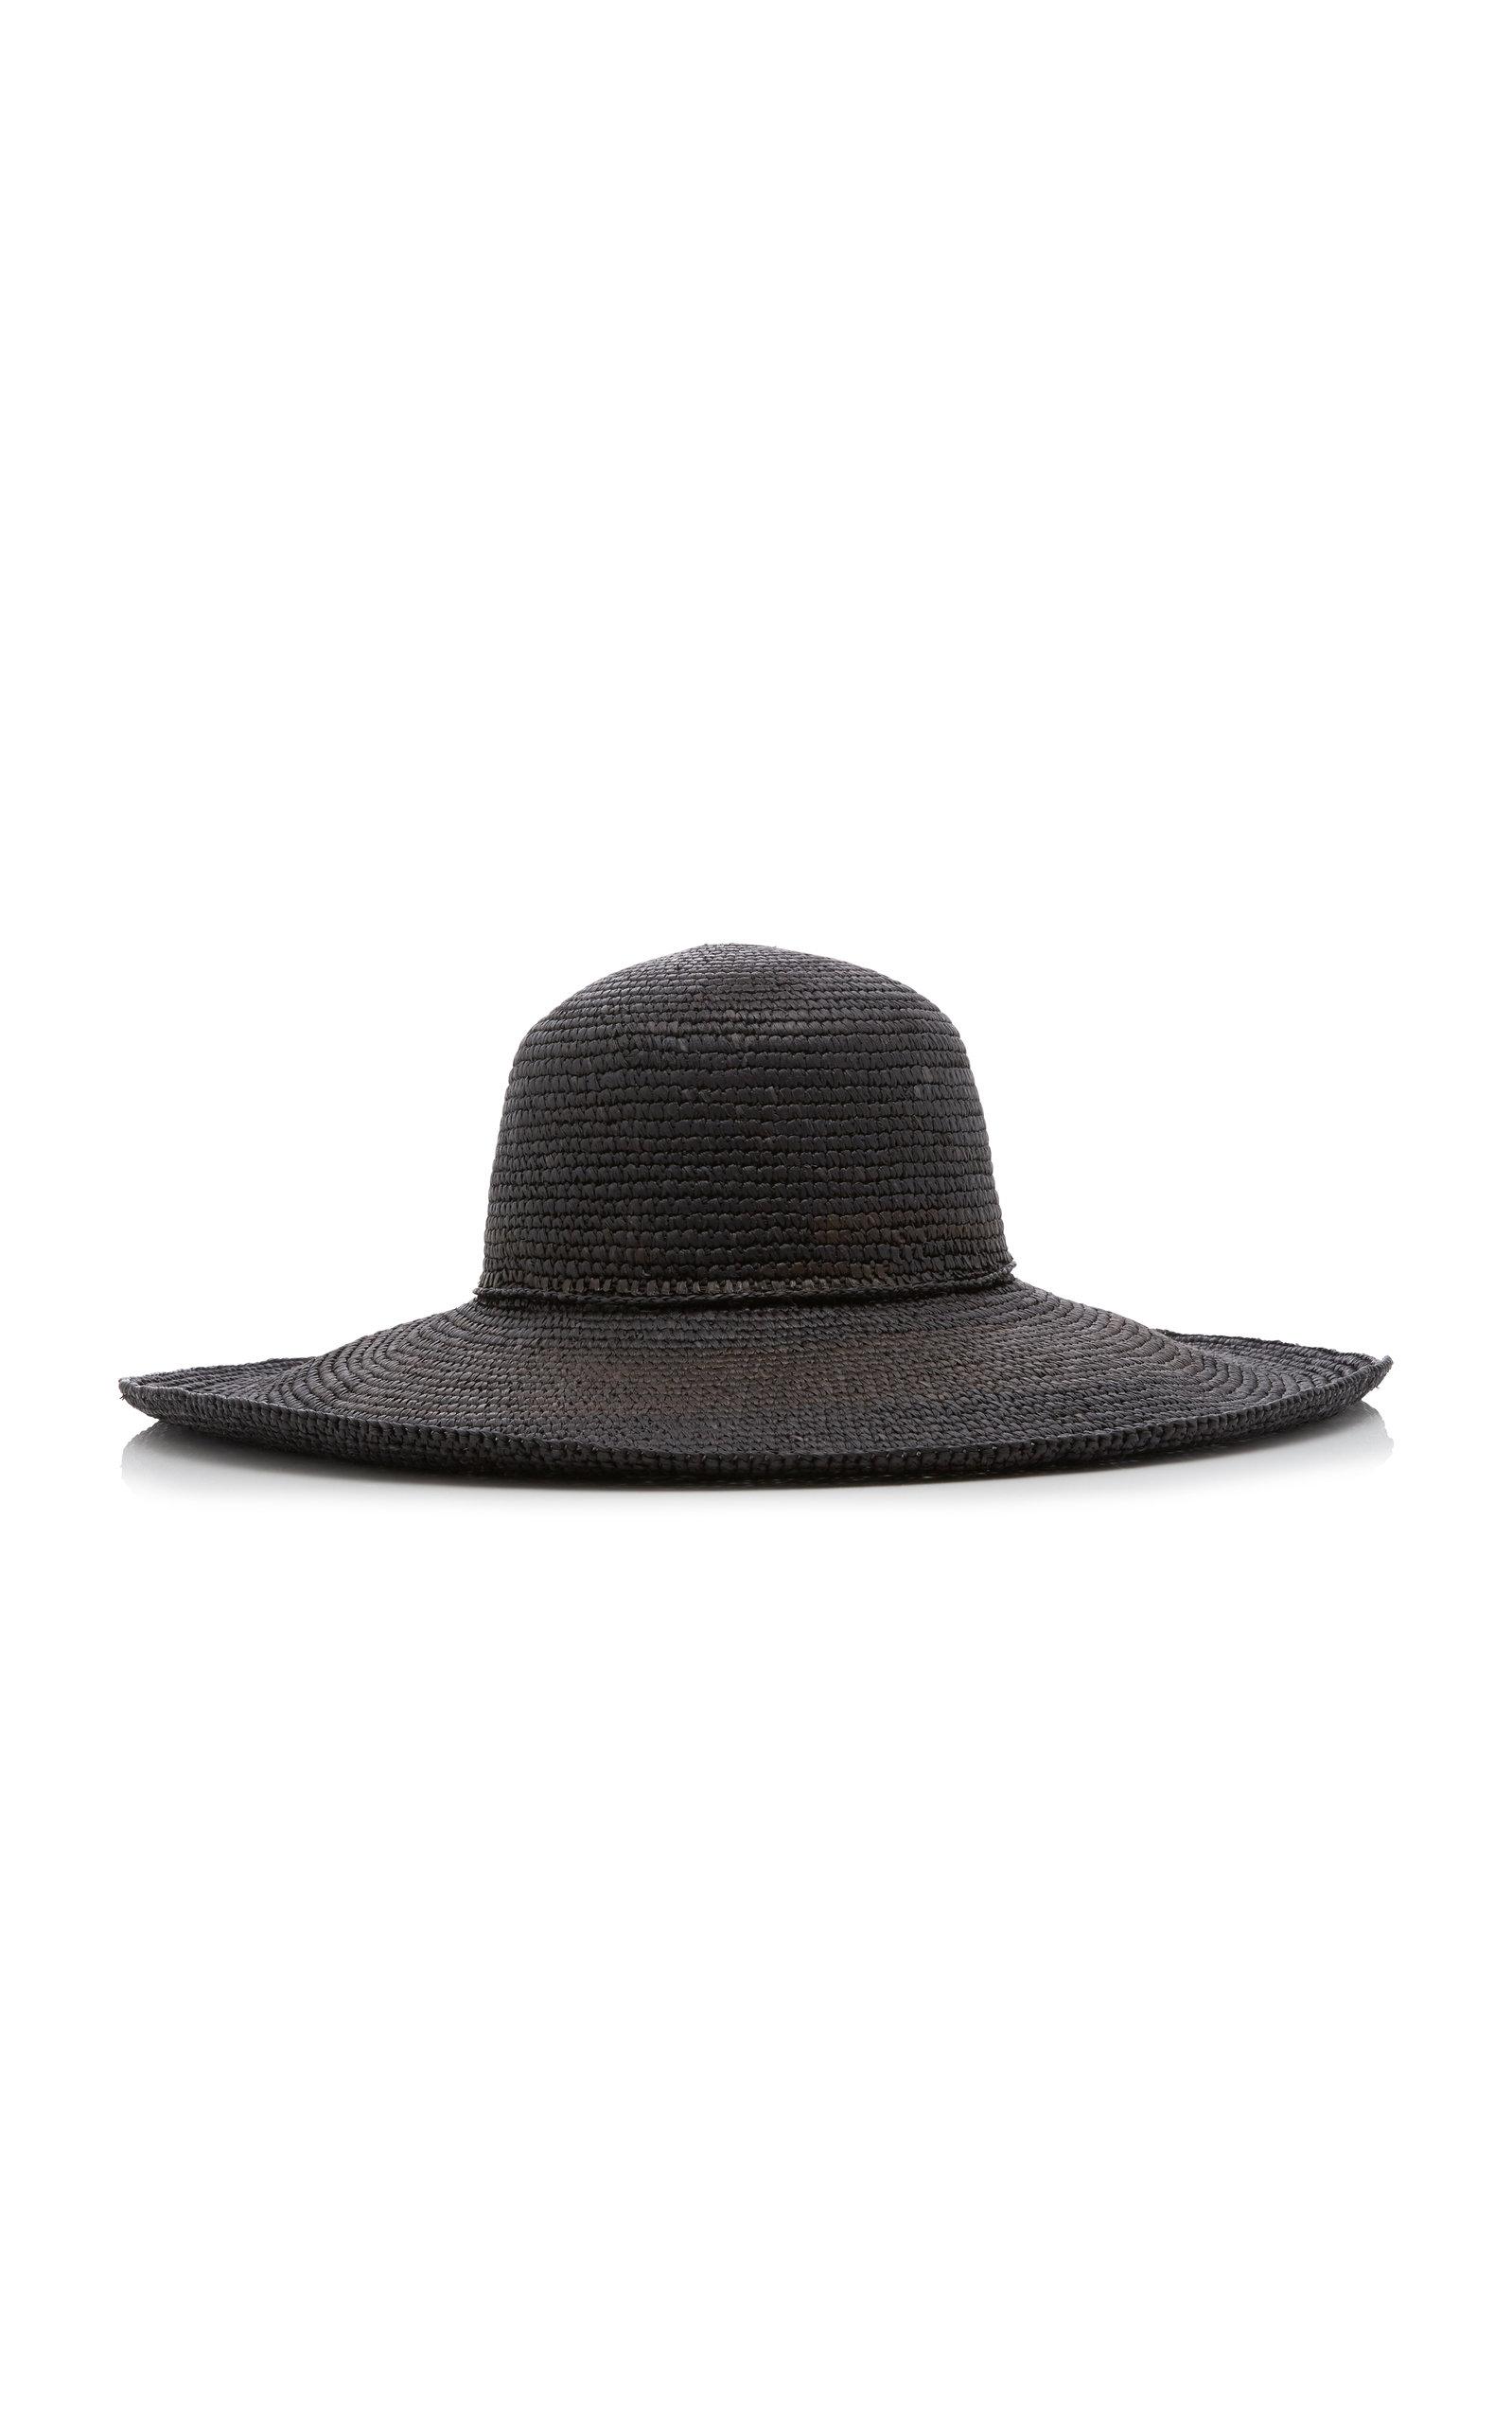 b2316e16bed16 Sensi StudioWide Brim Straw Hat. CLOSE. Loading